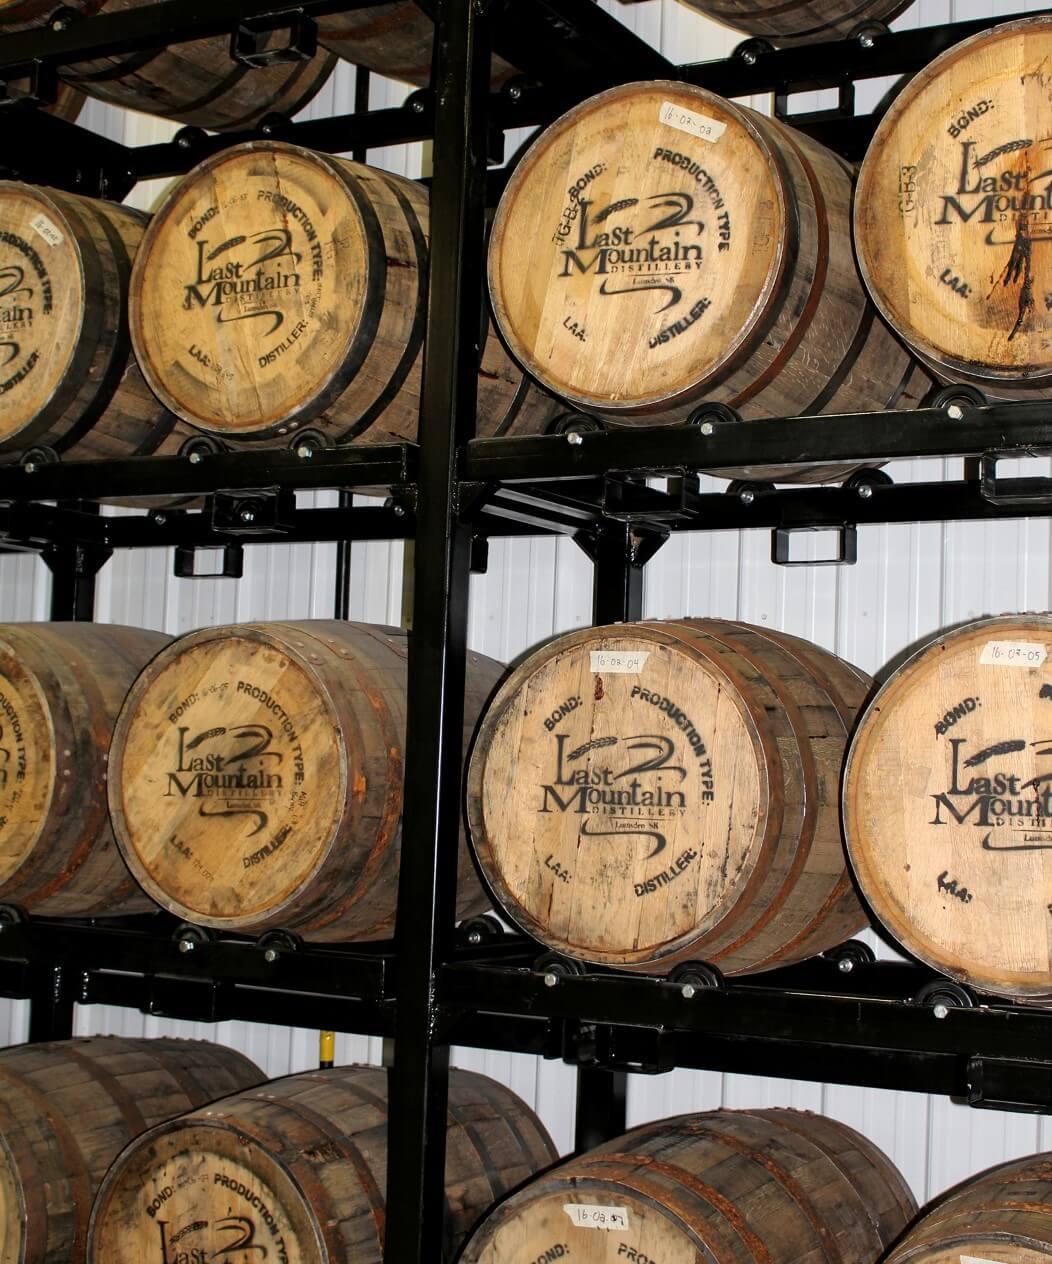 Casks maturing at Last Mountain Distillery